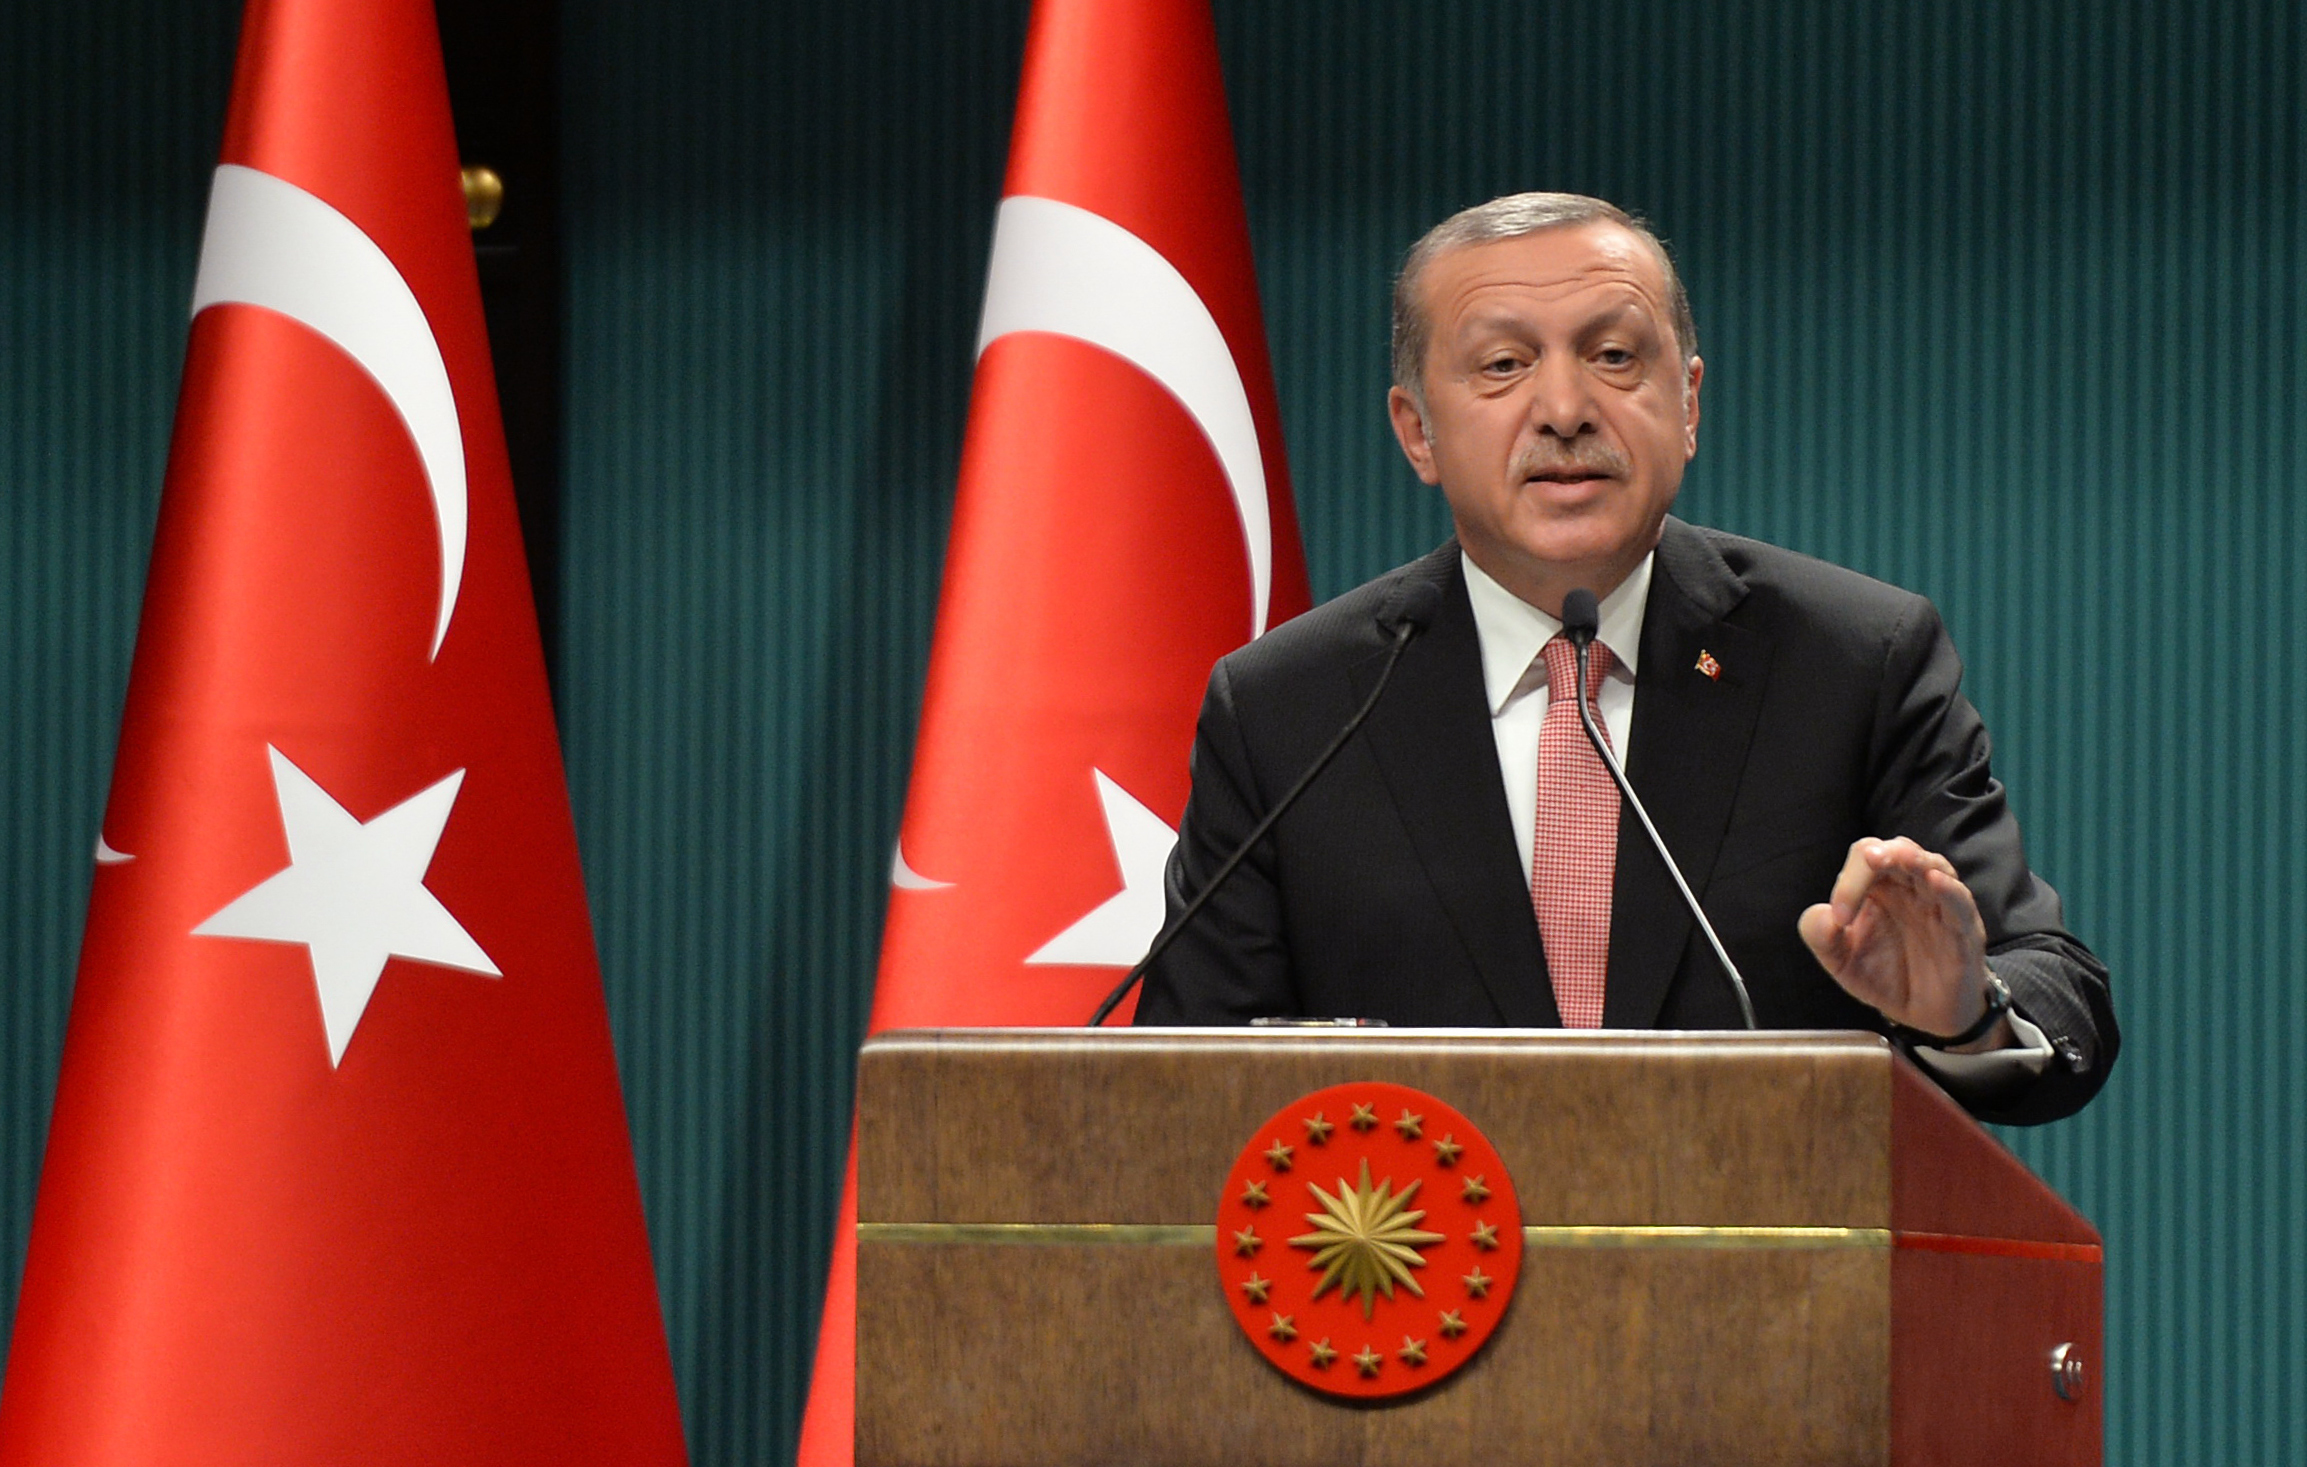 erdogan, tyrkiet, valg udemokratisk, folkeafstemning, diplomatisk krise, diplomati, eu, nej, ja,